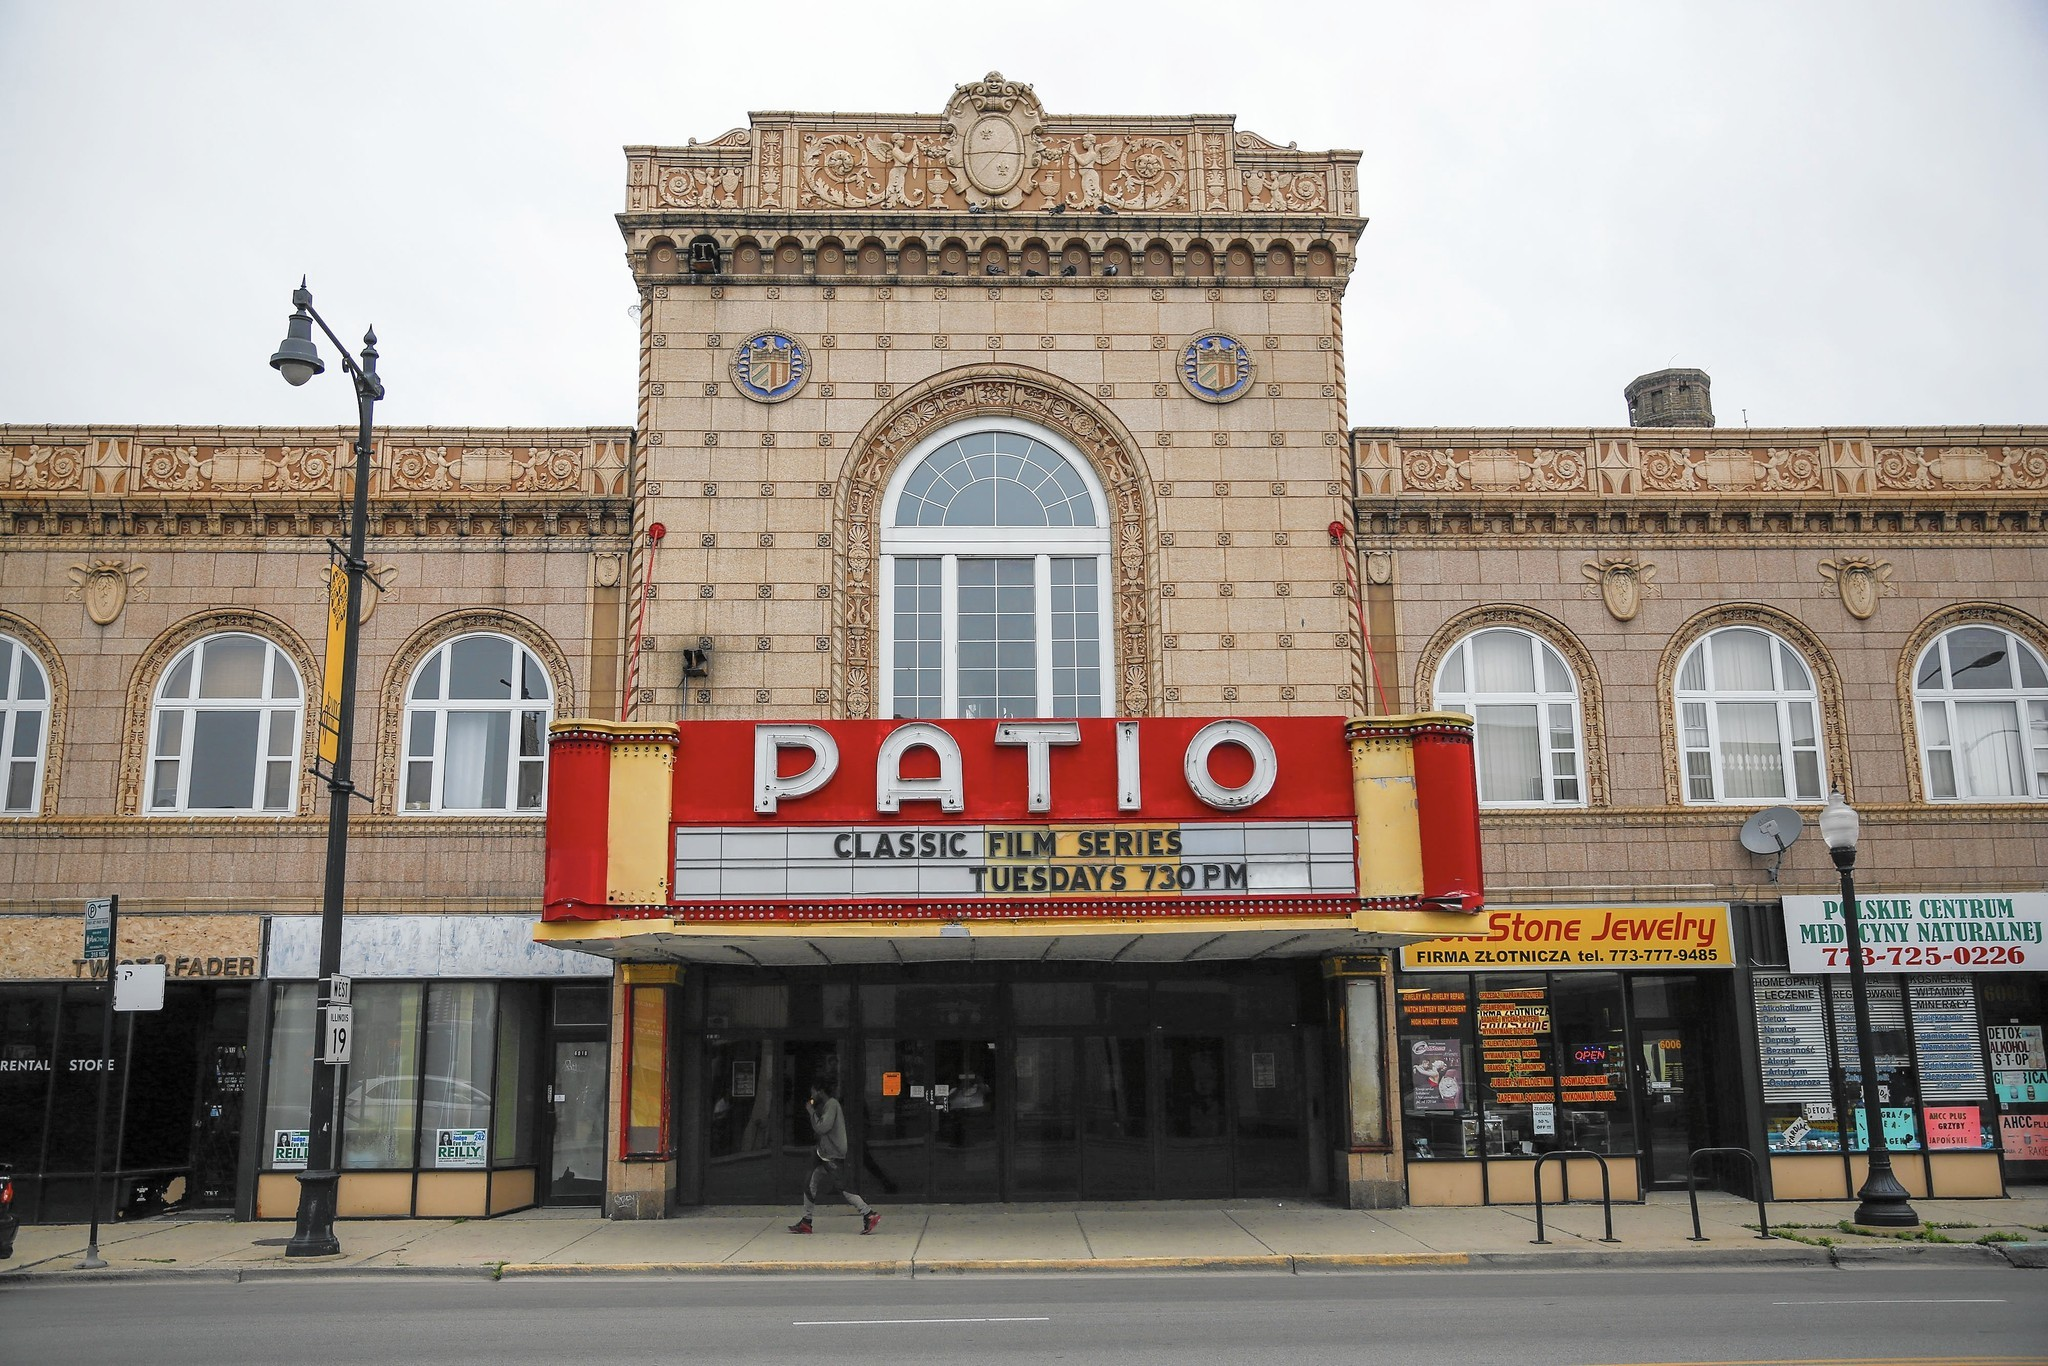 Residents Wary As Patio Theater Operators Seek Liquor License Chicago Tribune